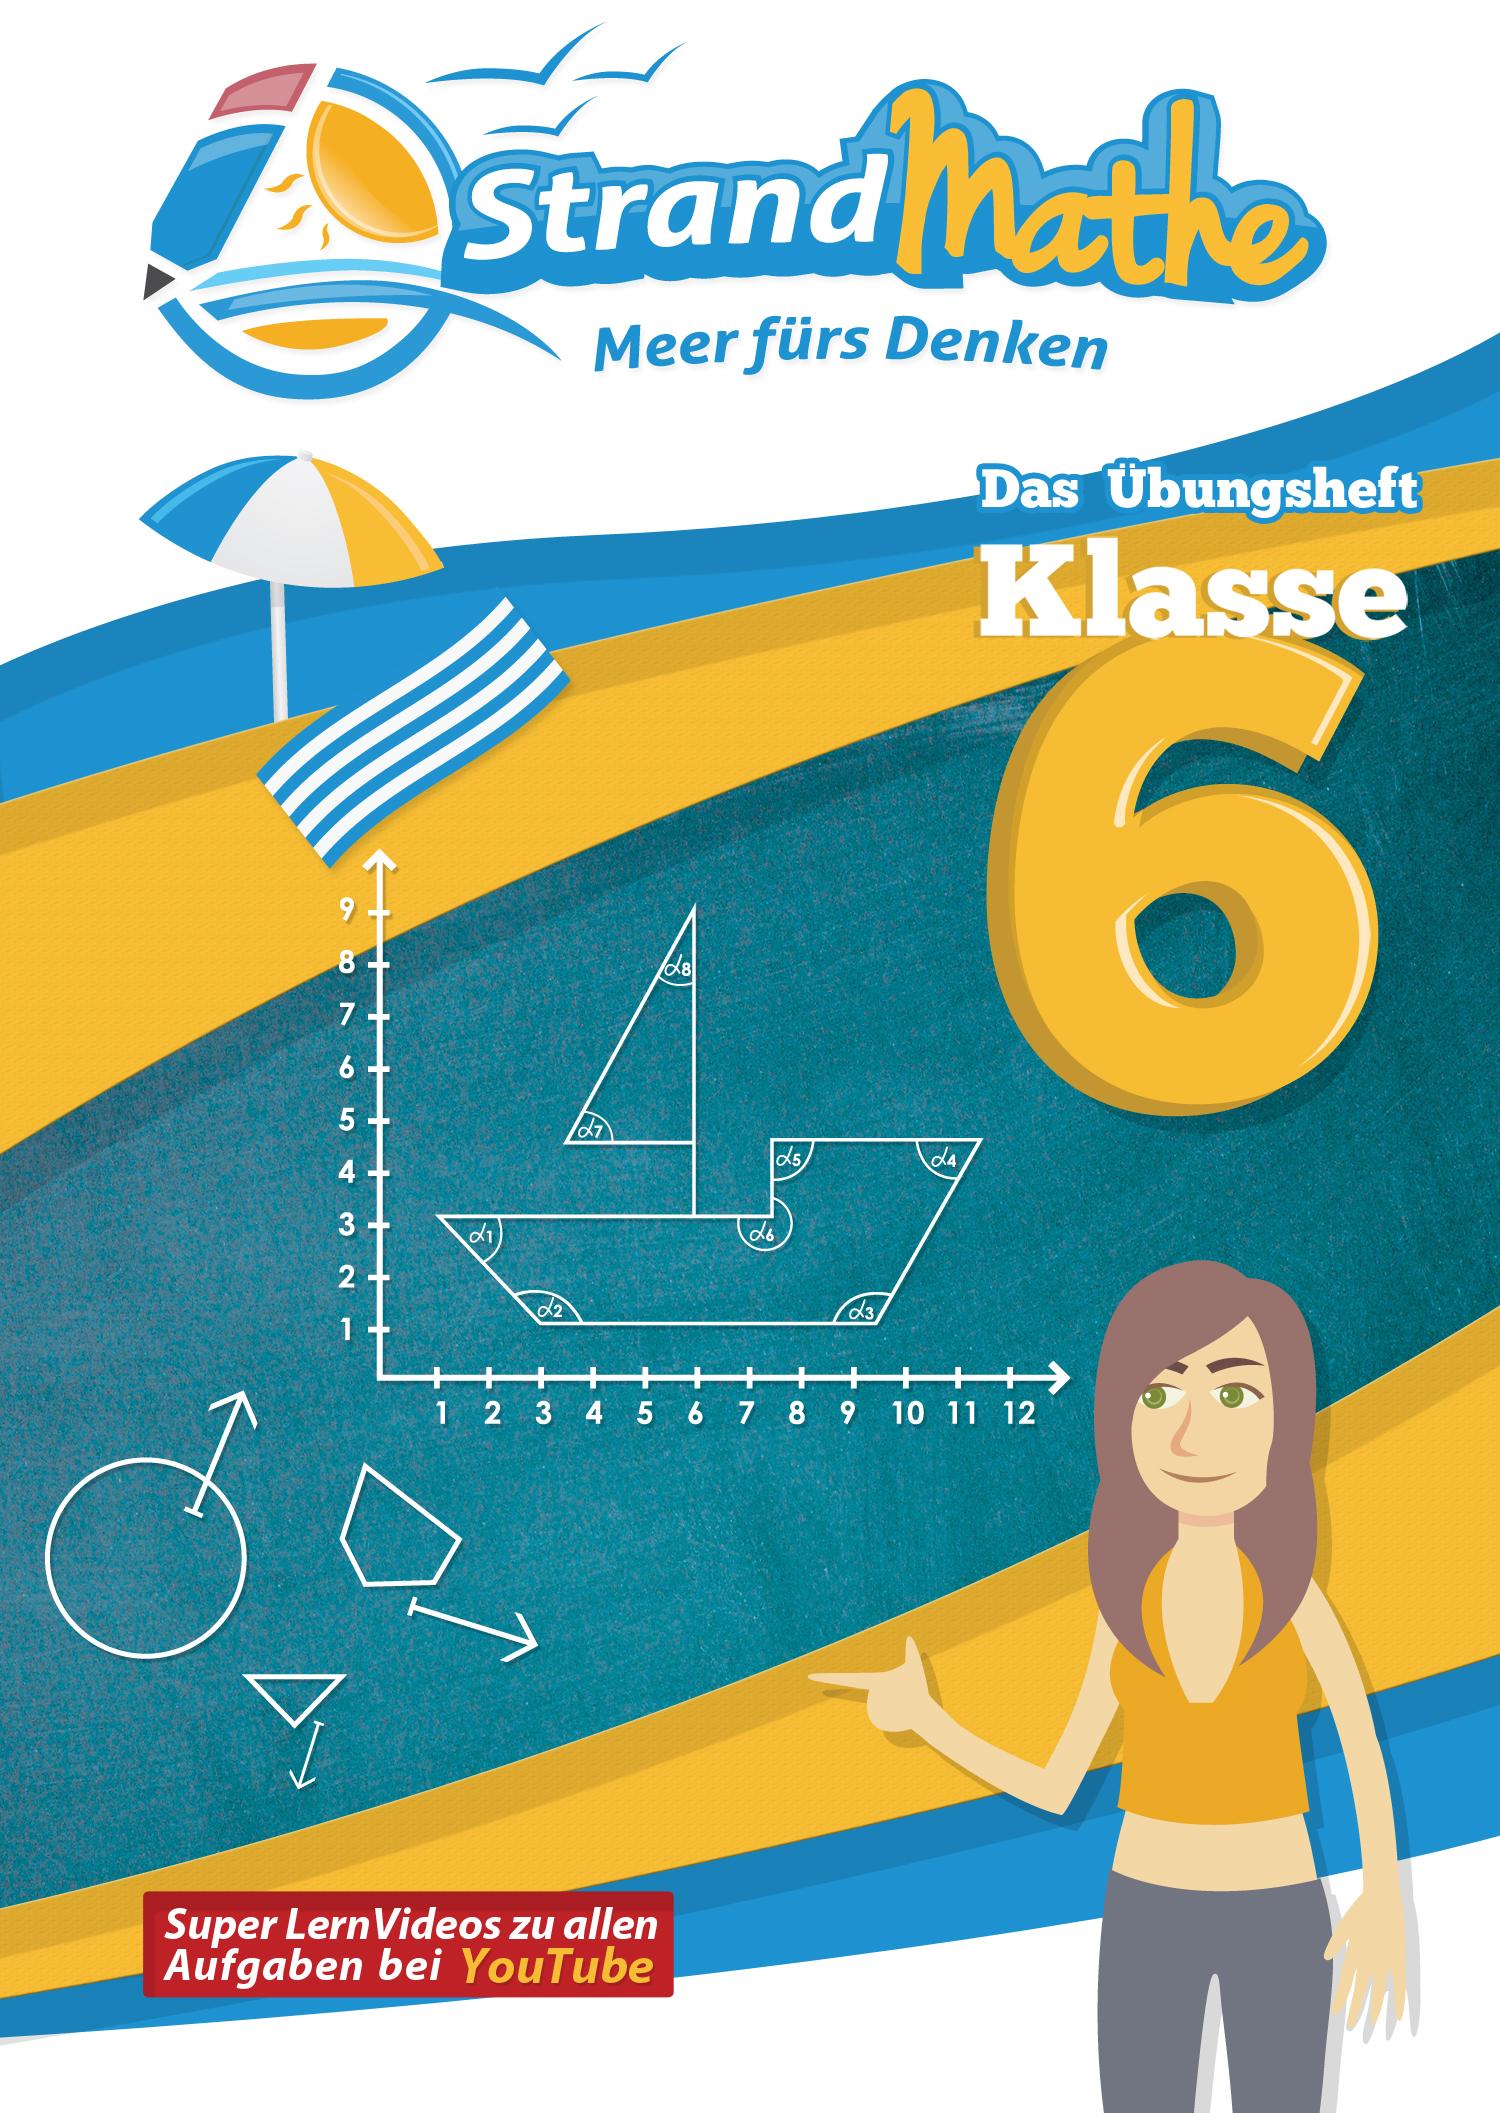 Mathe-Übungsheft für die Klasse 6 Sek I | StrandMathe